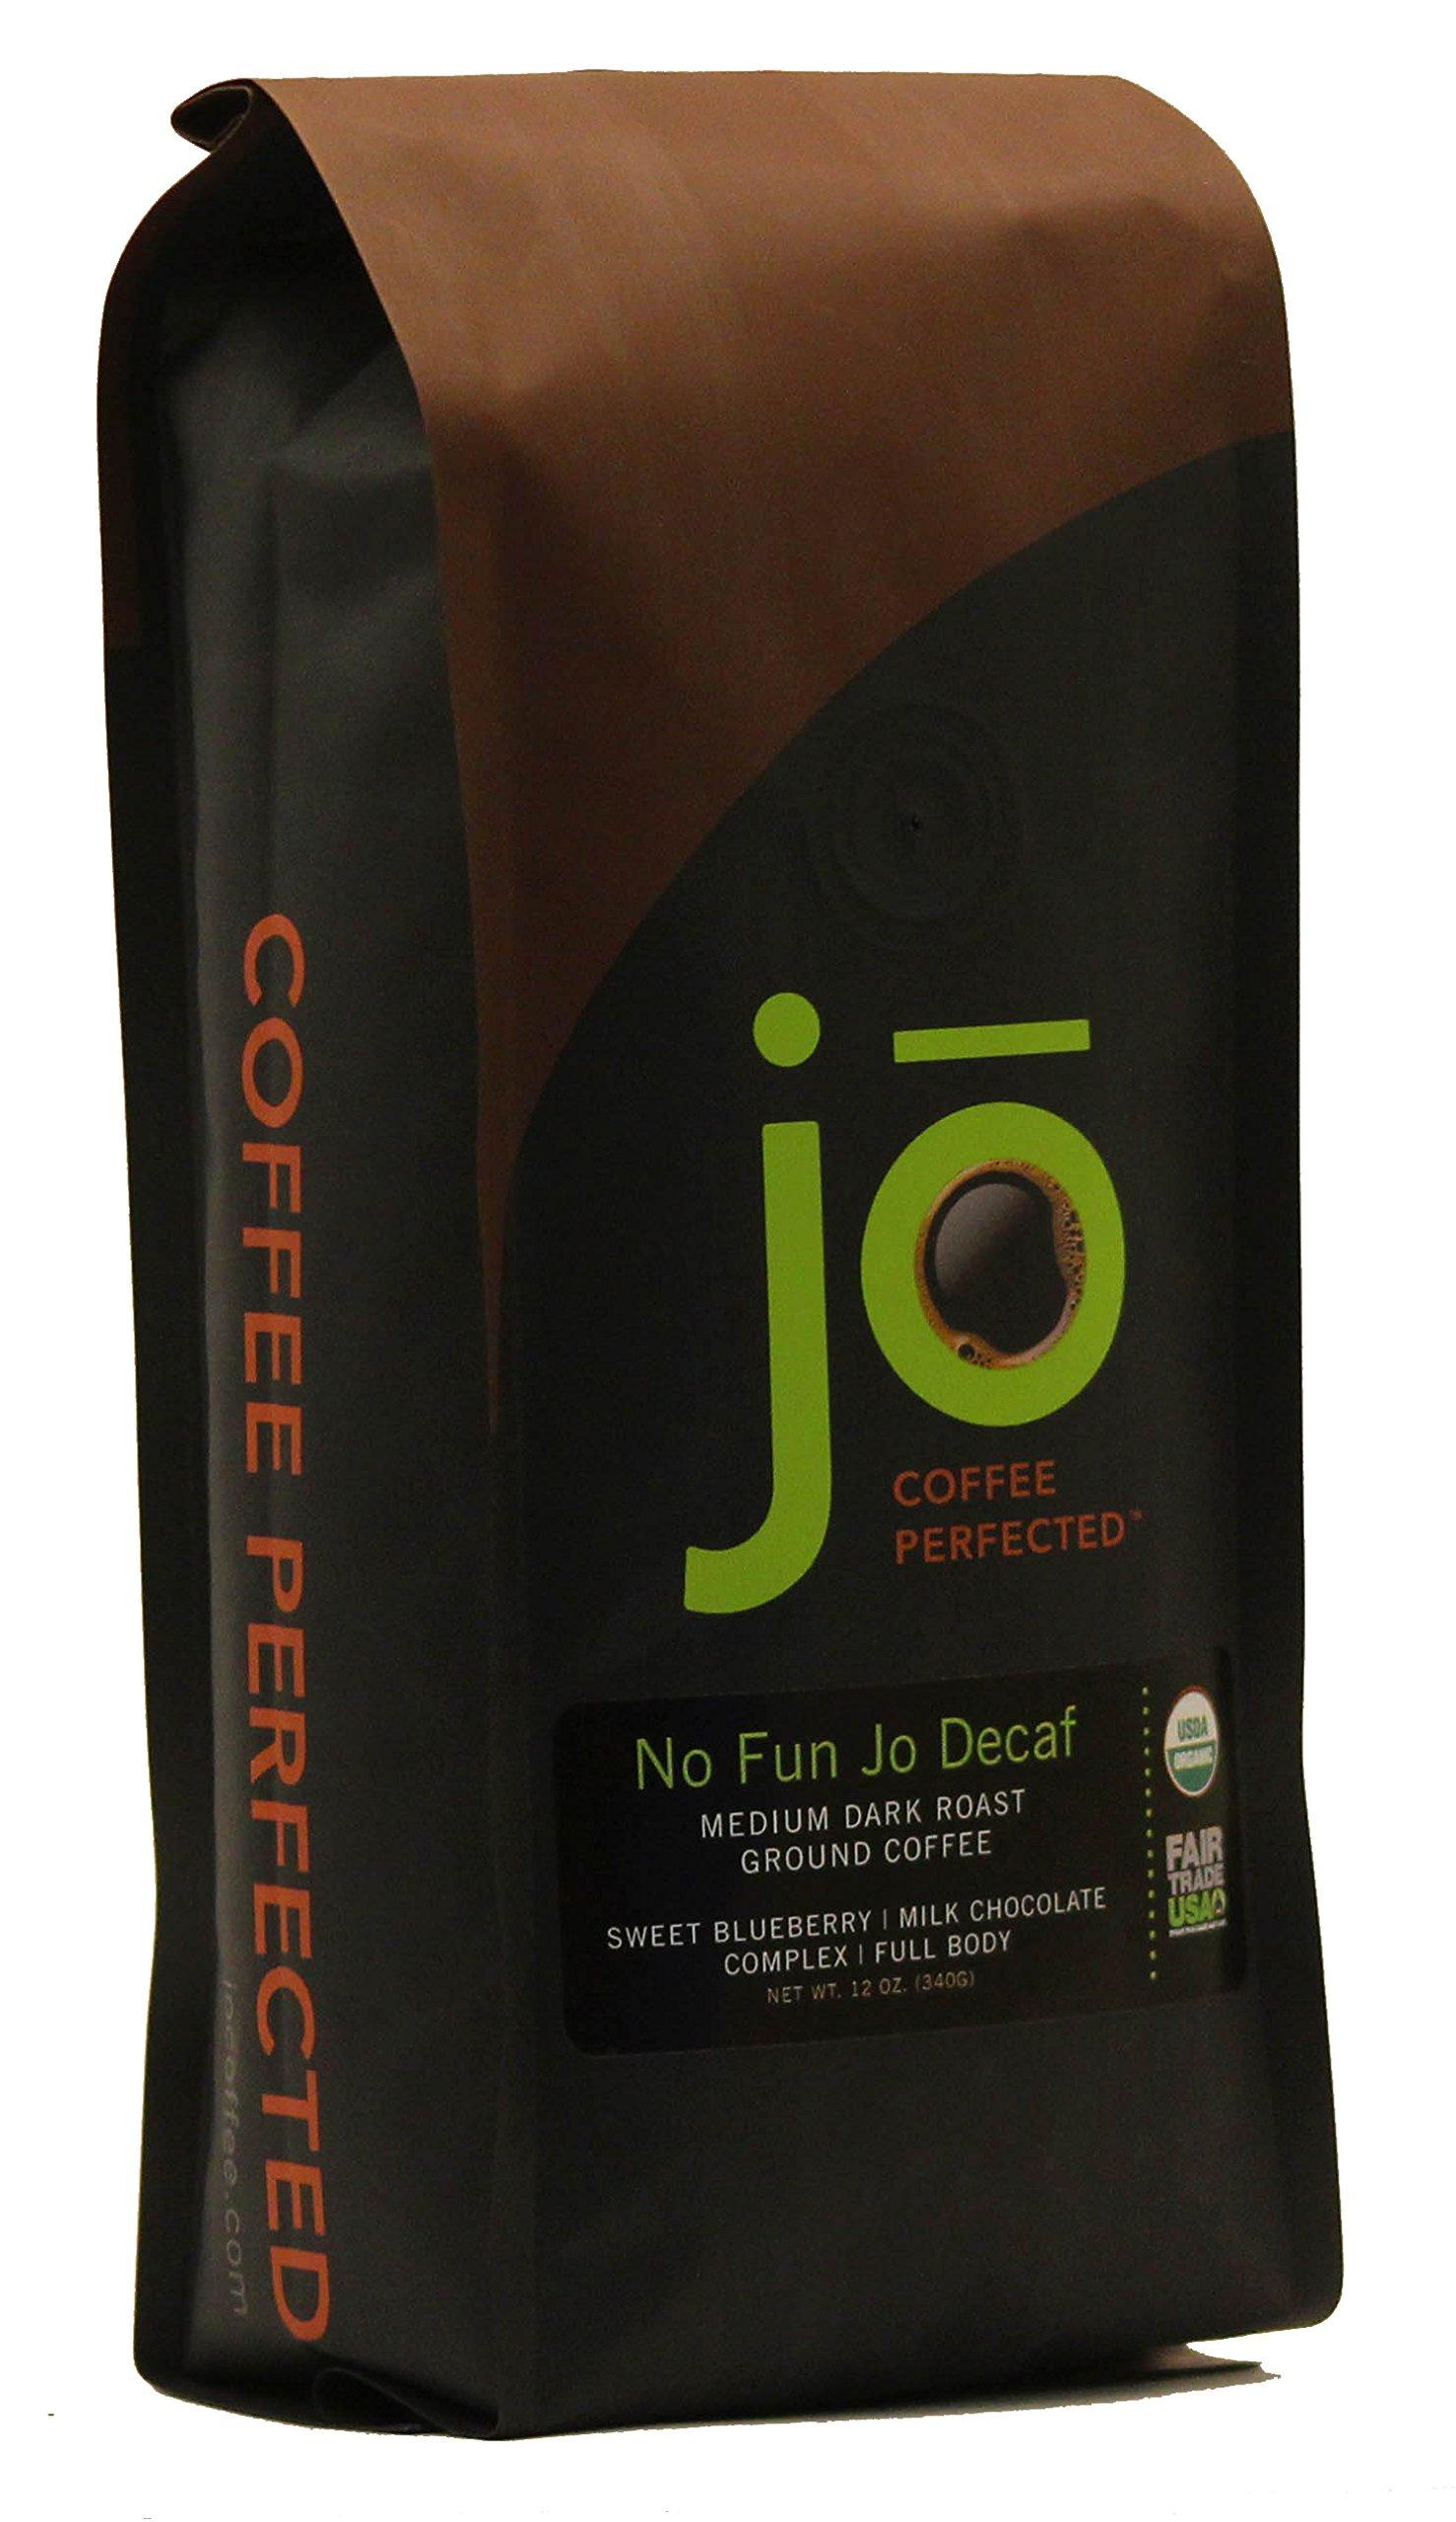 NO FUN JO DECAF: 12 oz, Organic Decaf Ground Coffee, Swiss Water Process, Fair Trade Certified, Medium Dark Roast, 100% Arabica Coffee, USDA Certified Organic, NON-GMO, Chemical Free Decaf